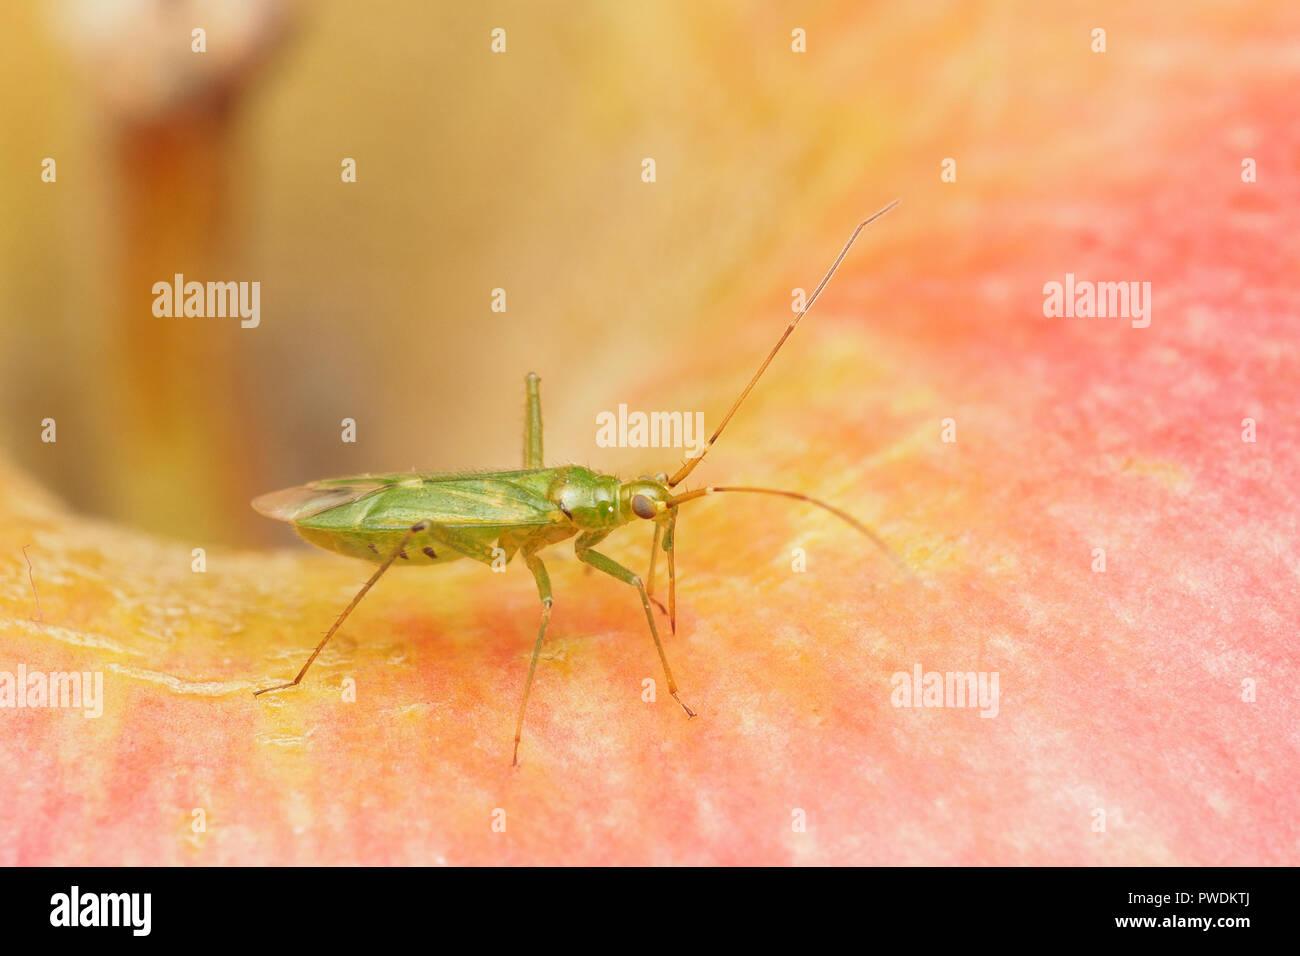 Capsid Bug (Blepharidopterus angulatus) on an apple. Tipperary, Ireland - Stock Image